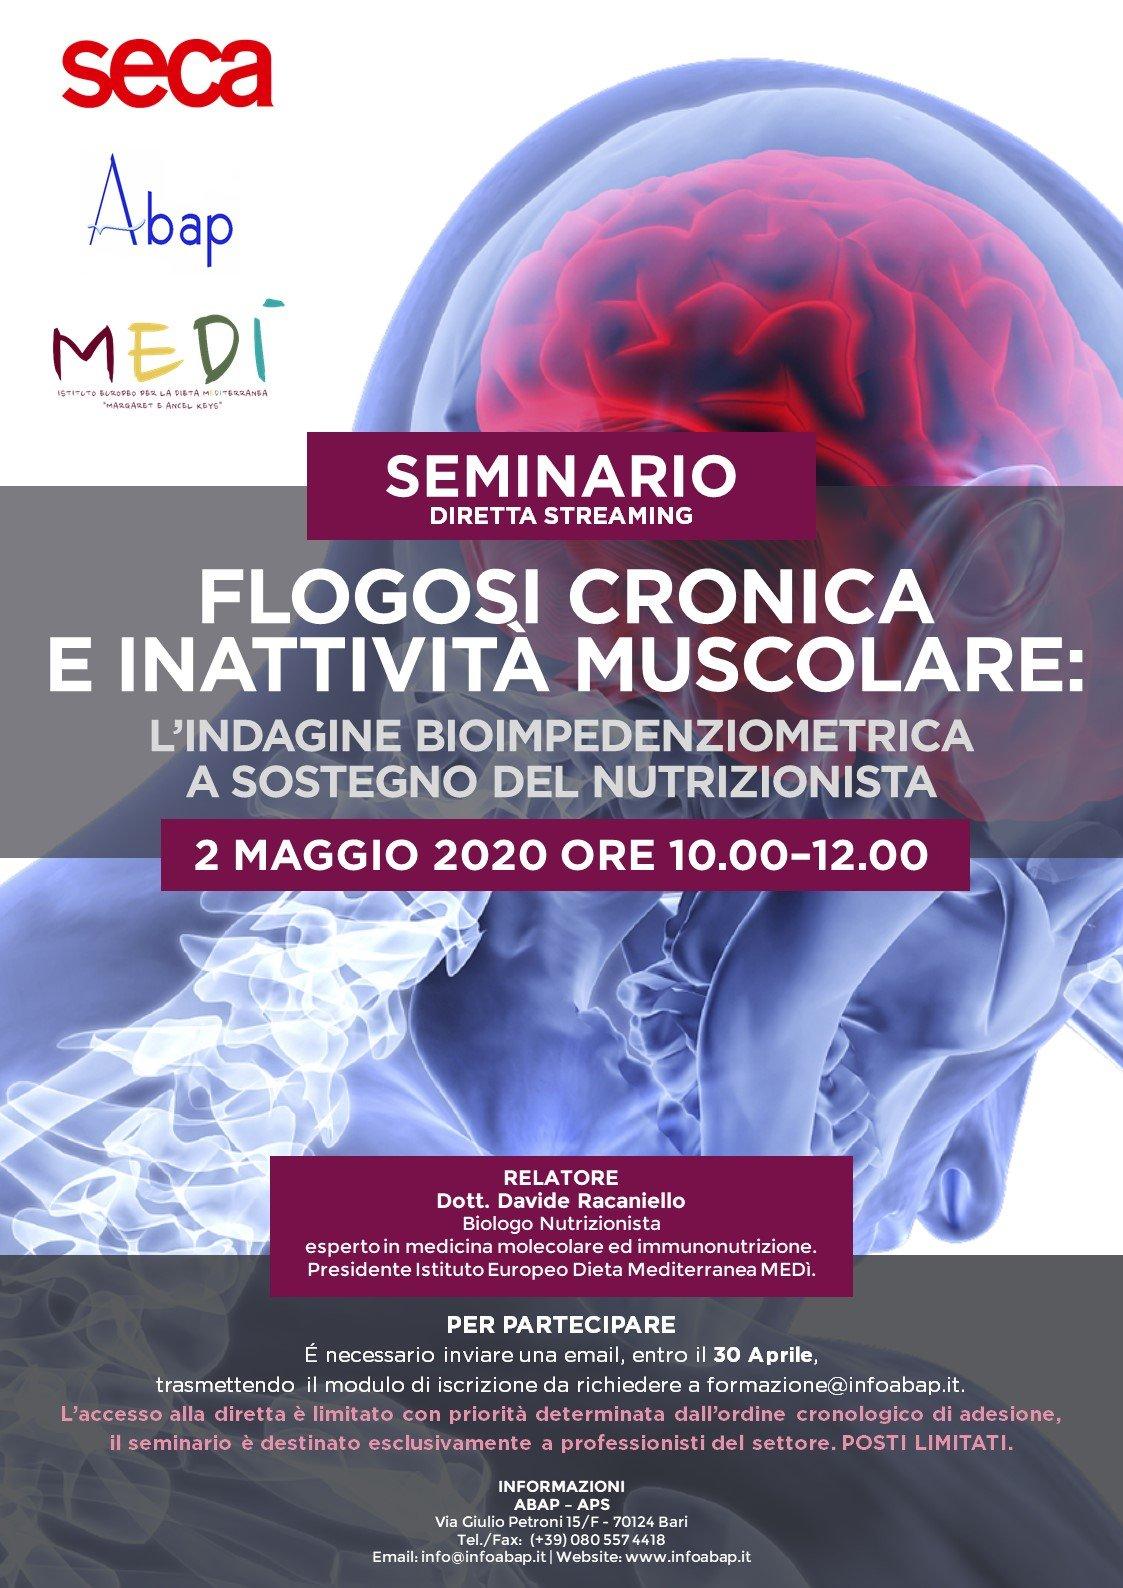 locandina-flogosi-cronica-e-inattivit-muscolare-02-05-2020_abap